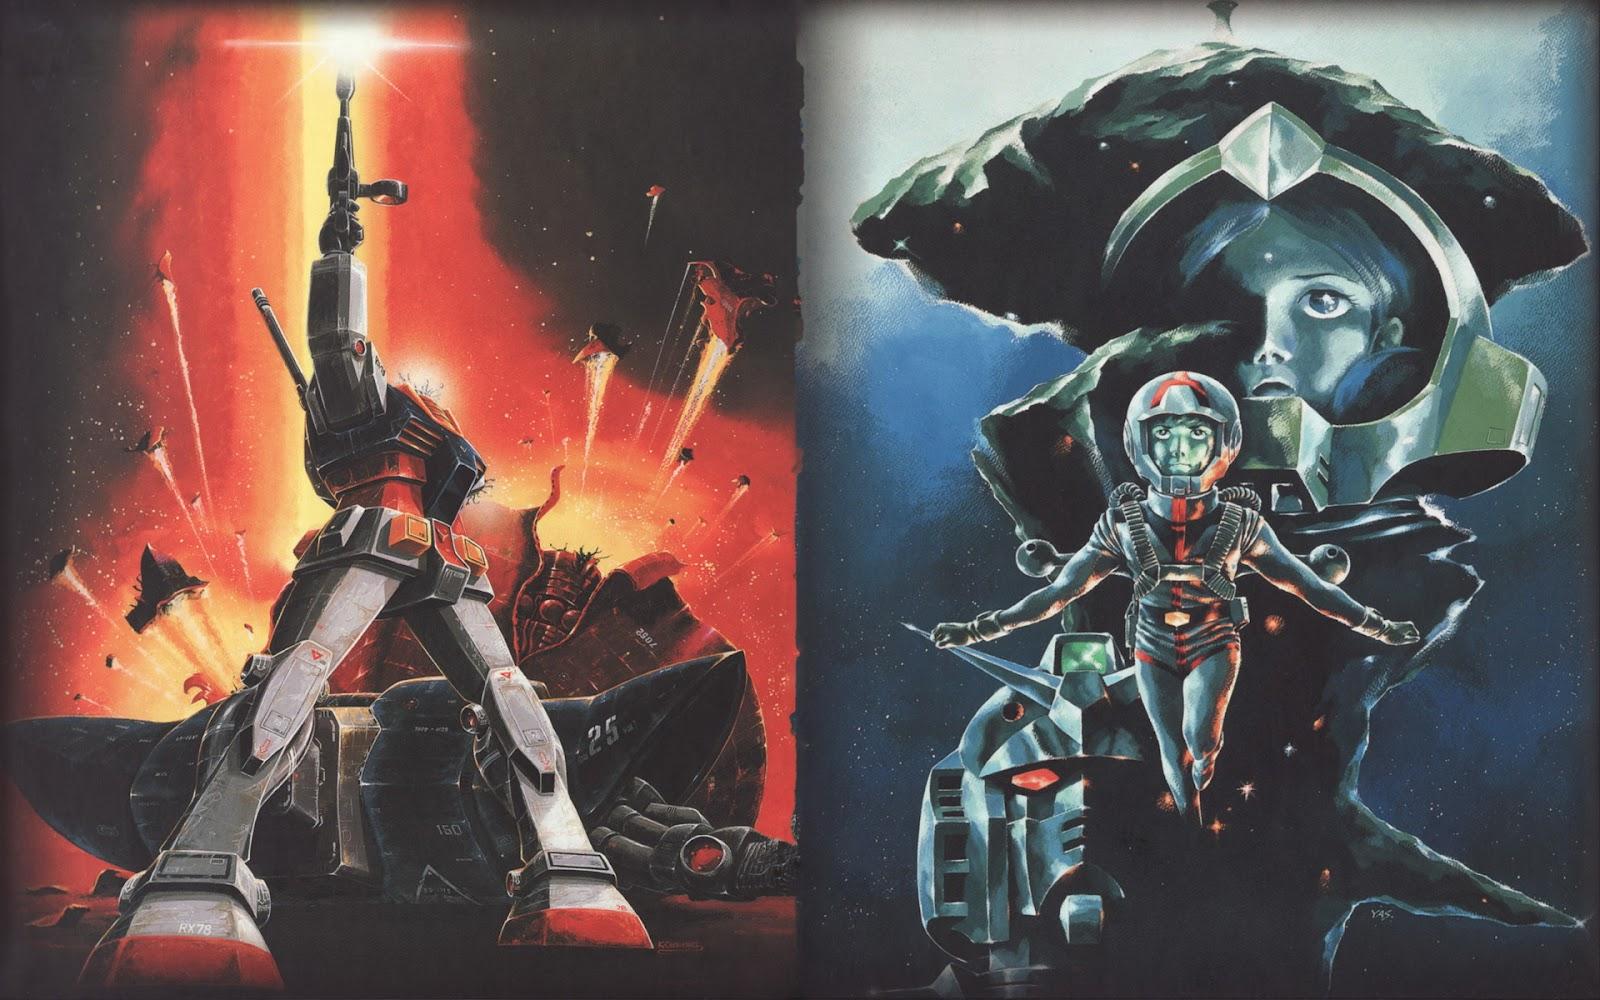 http://1.bp.blogspot.com/-mRZZn8BL_ak/T-iES8p4giI/AAAAAAAAn-Q/krkYGq2JsdM/s1600/Mobile-Suit-Gundam-III-Encounters-in-Space-1982-Wallpaper.jpg